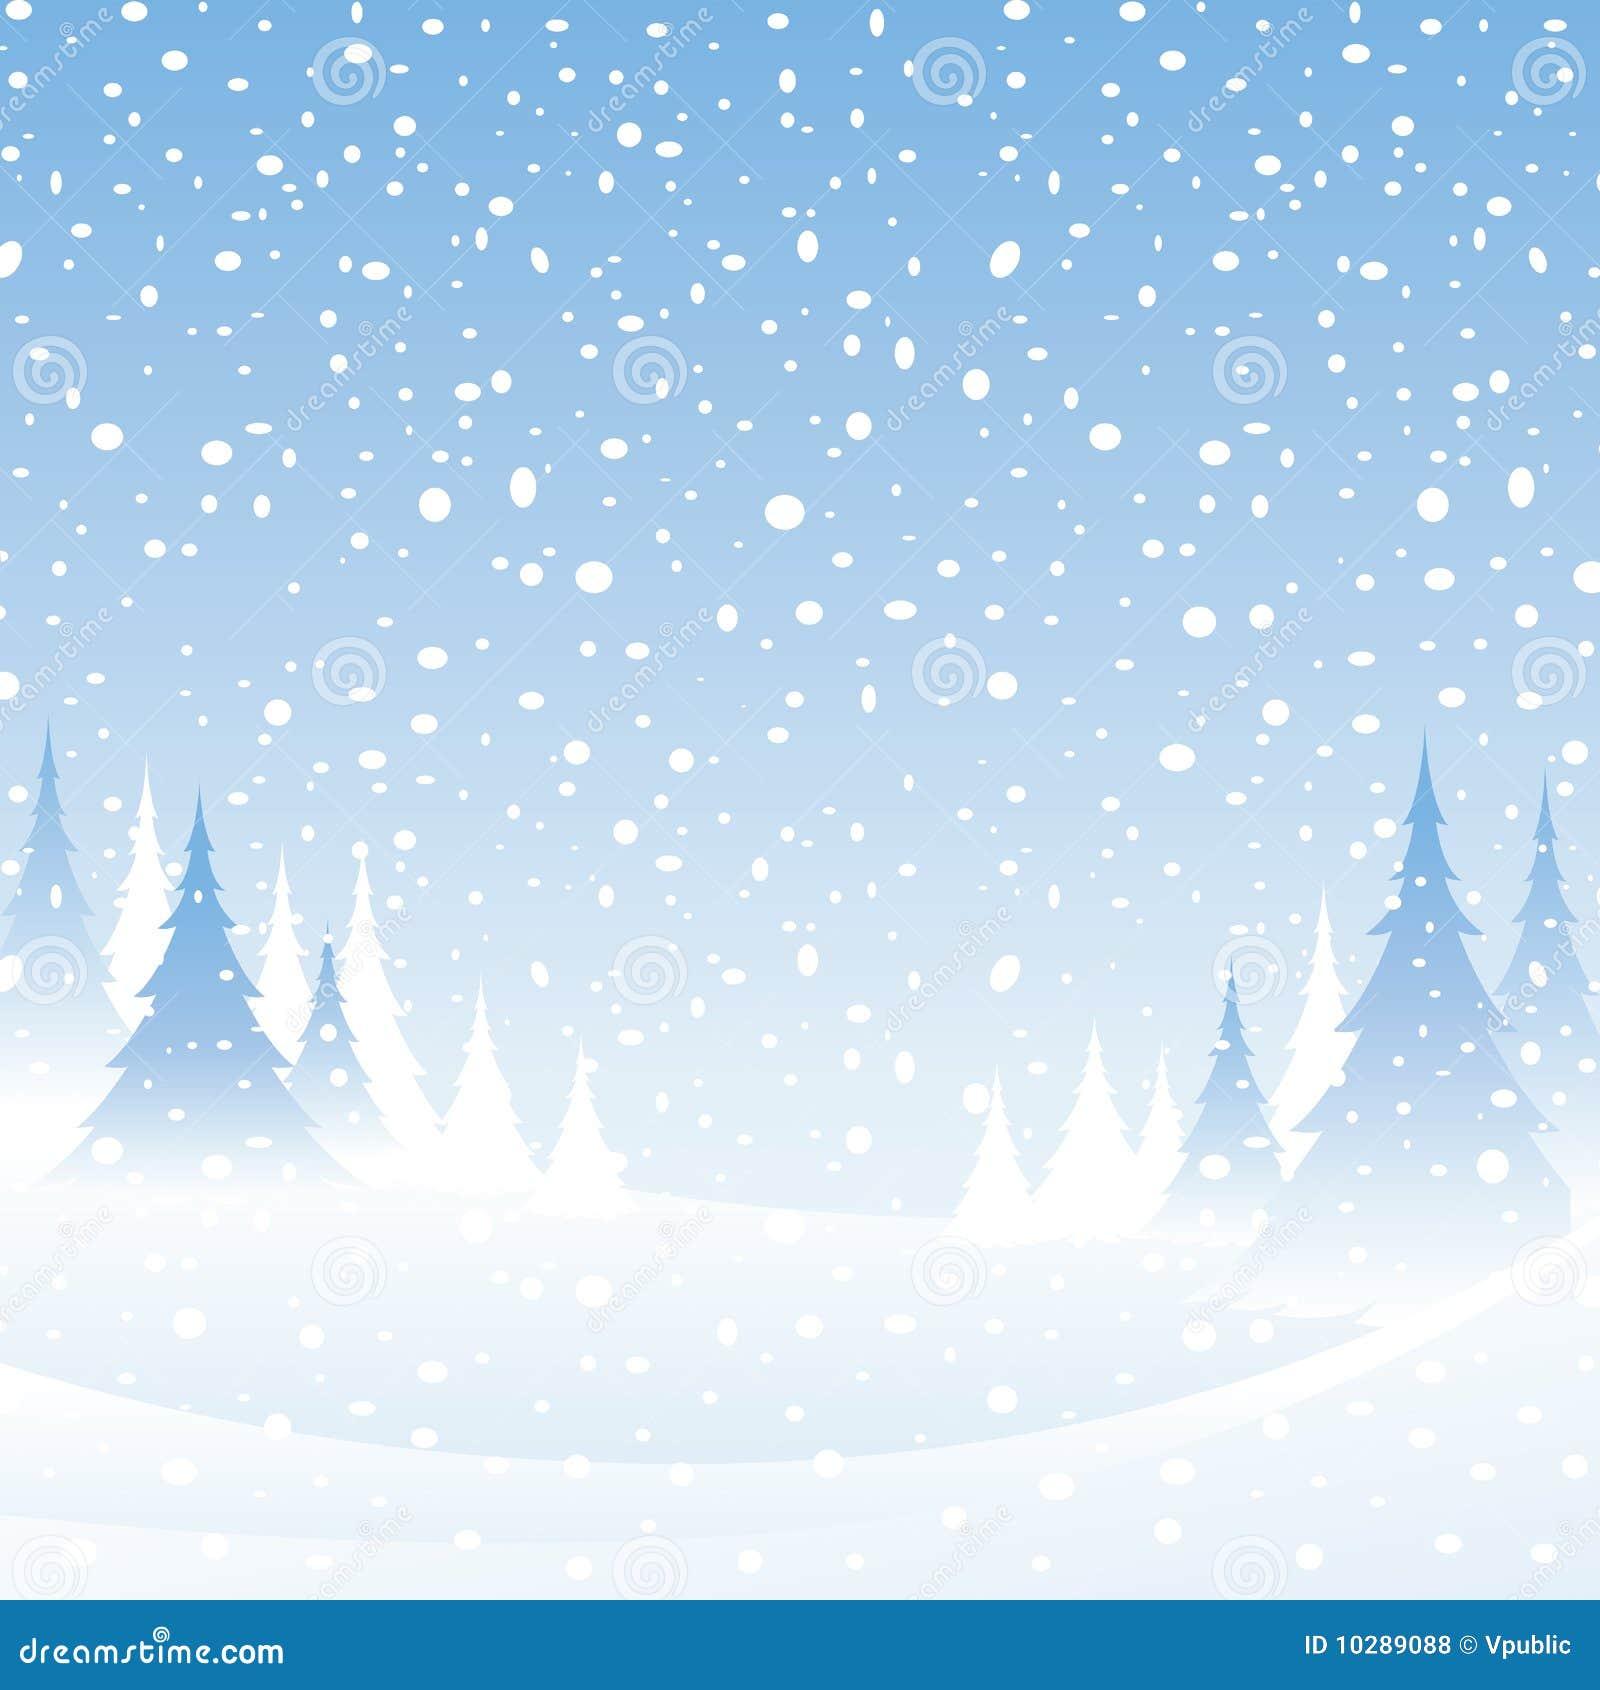 White Winter Scene Royalty Free Stock Photos - Image: 10289088